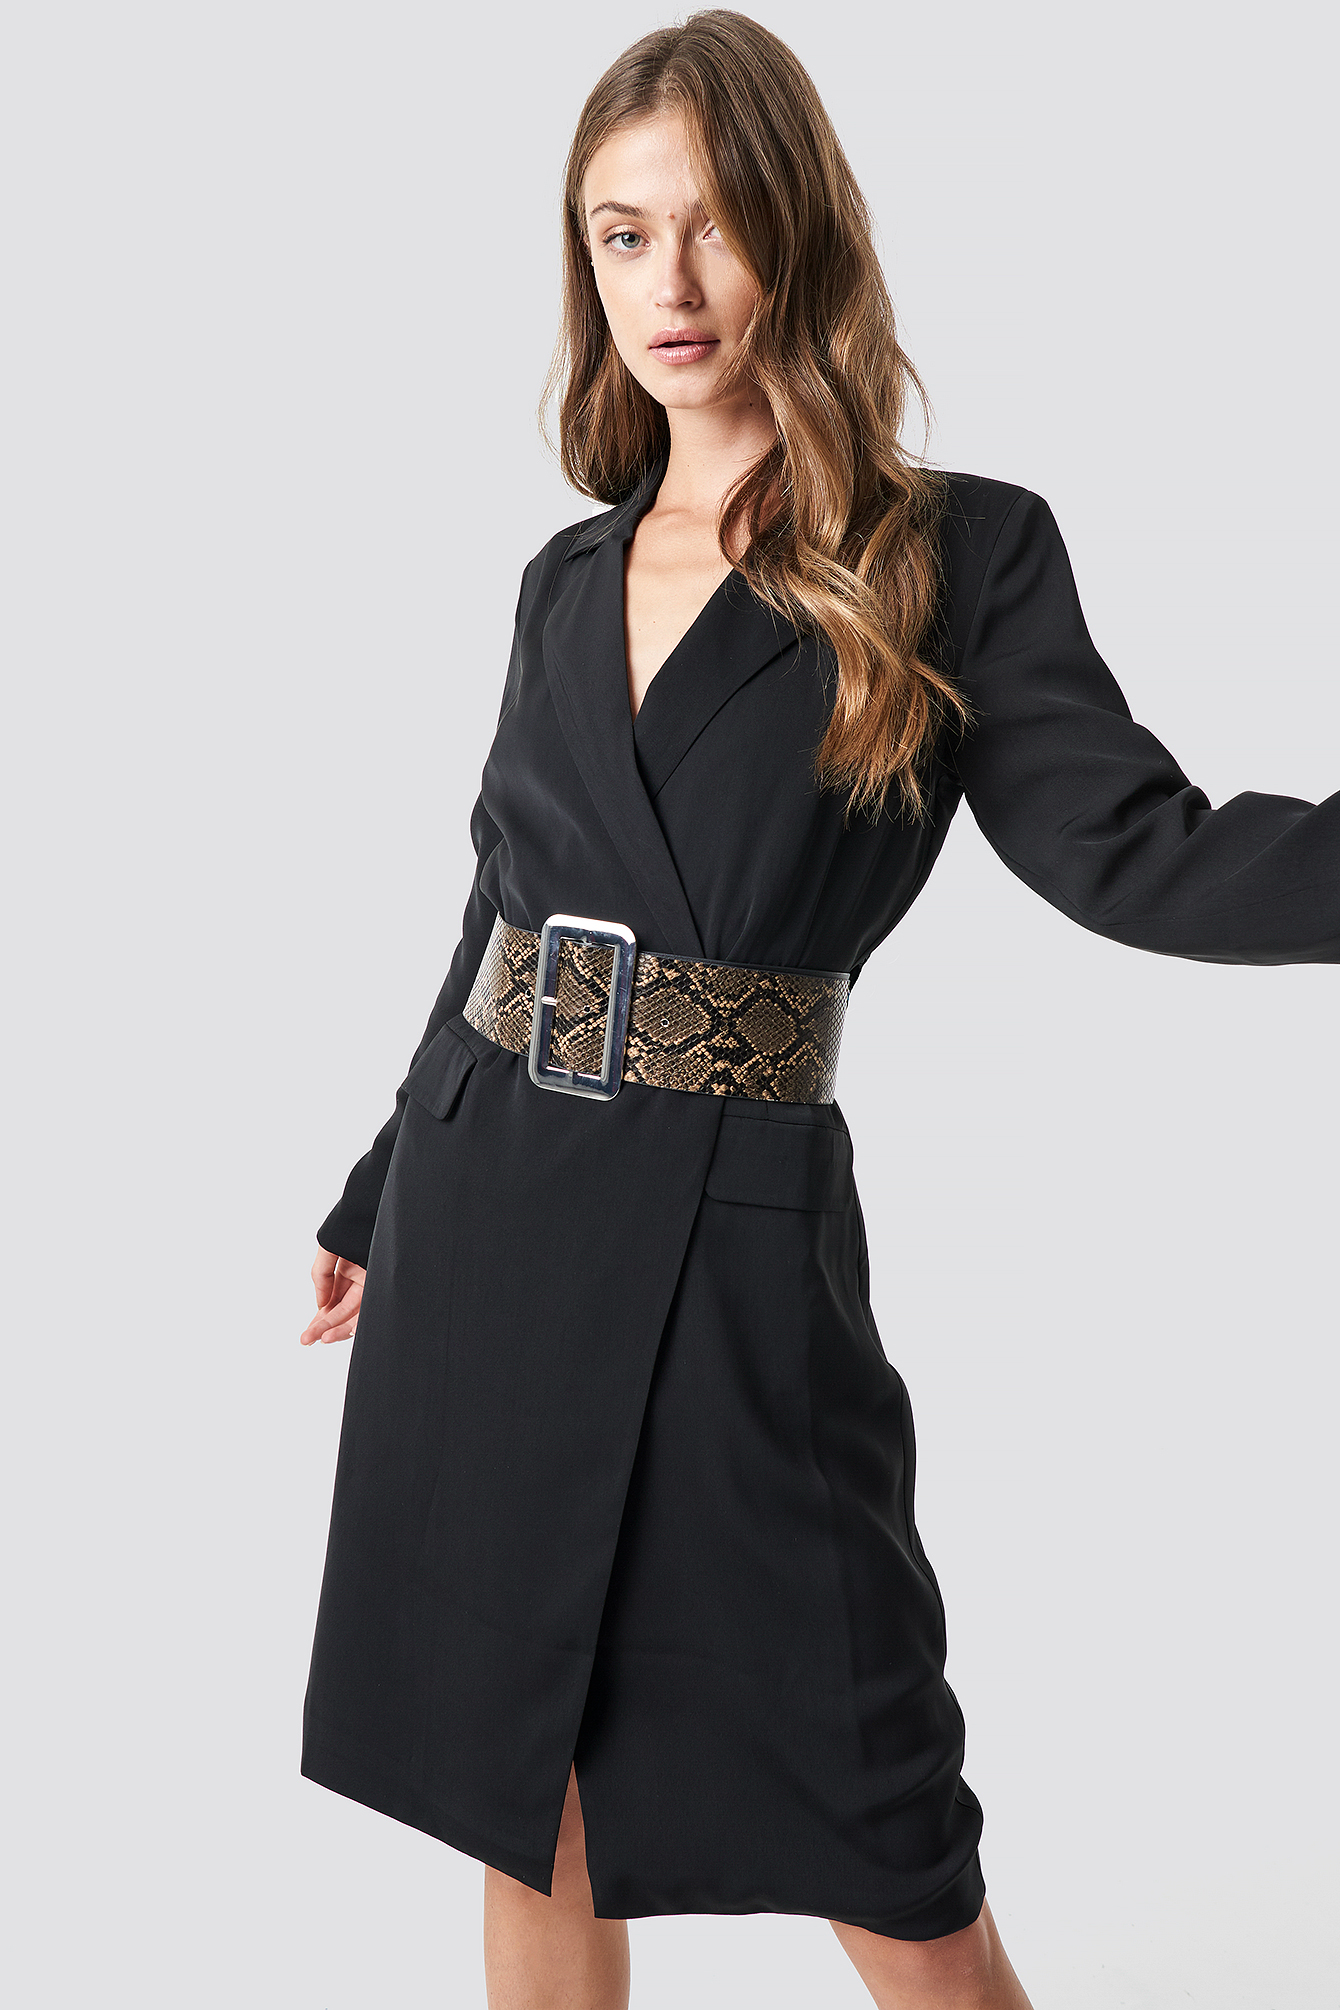 mango -  Cleo Belt - Black